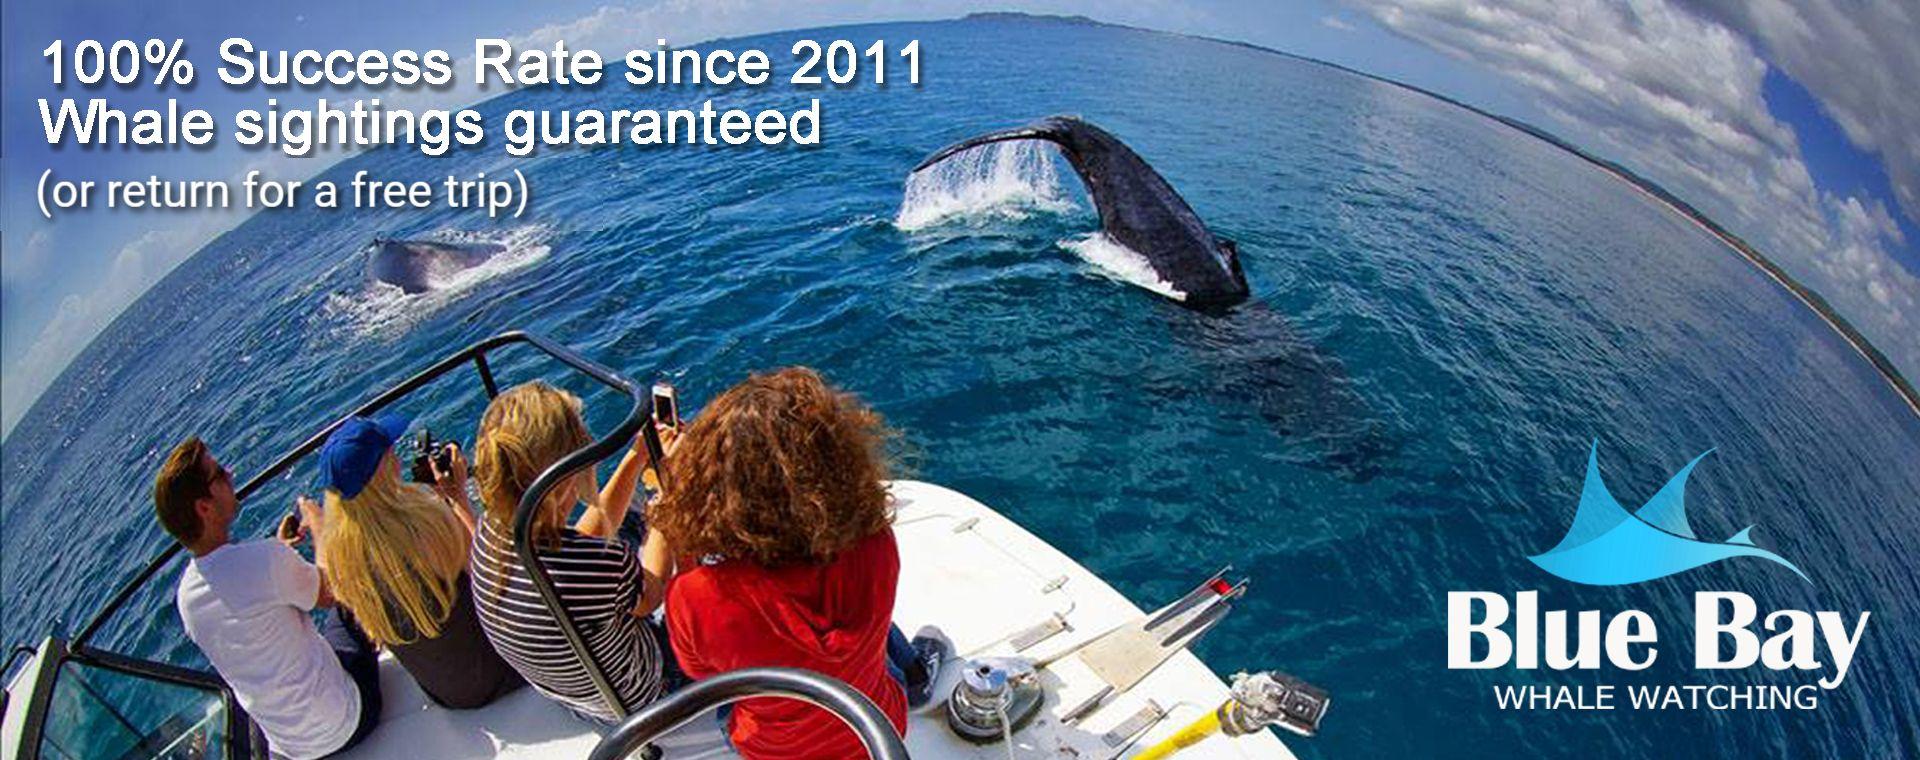 Whale Guarantee